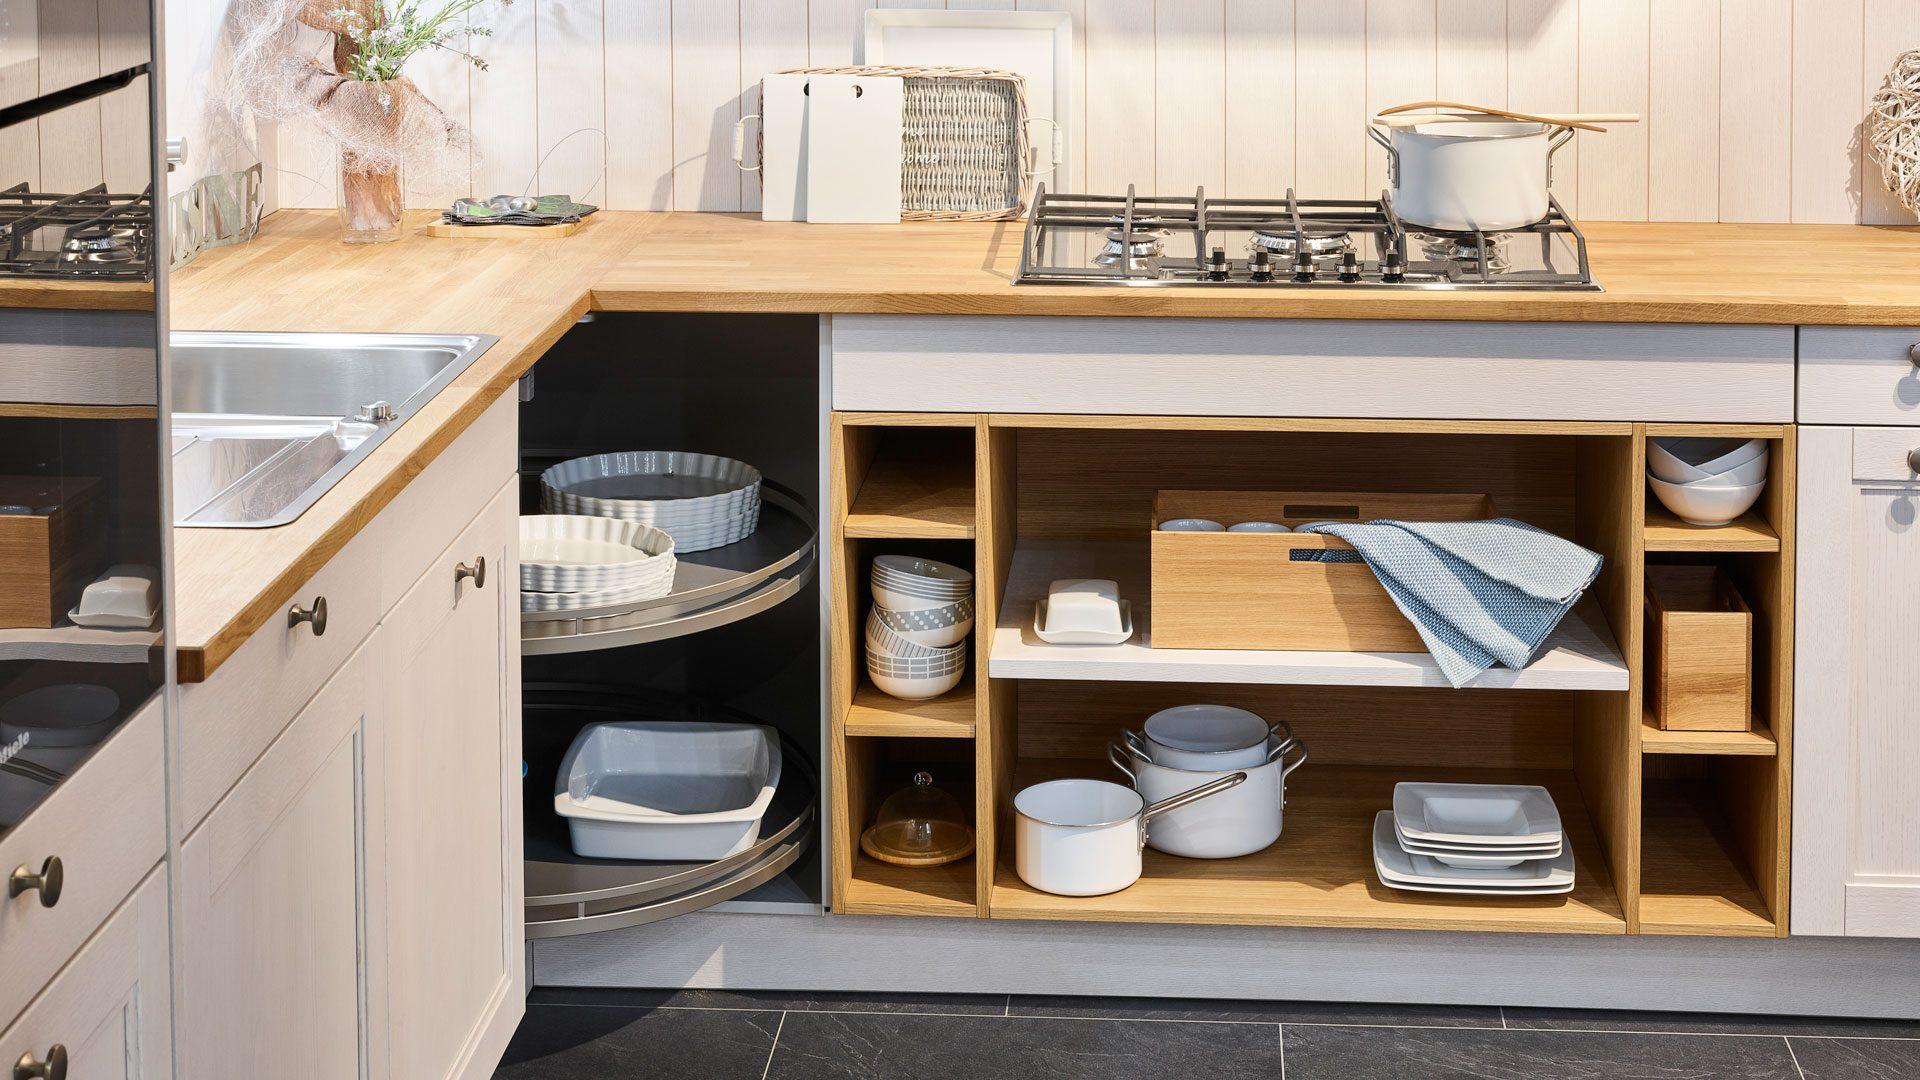 кухня с полками.jpg